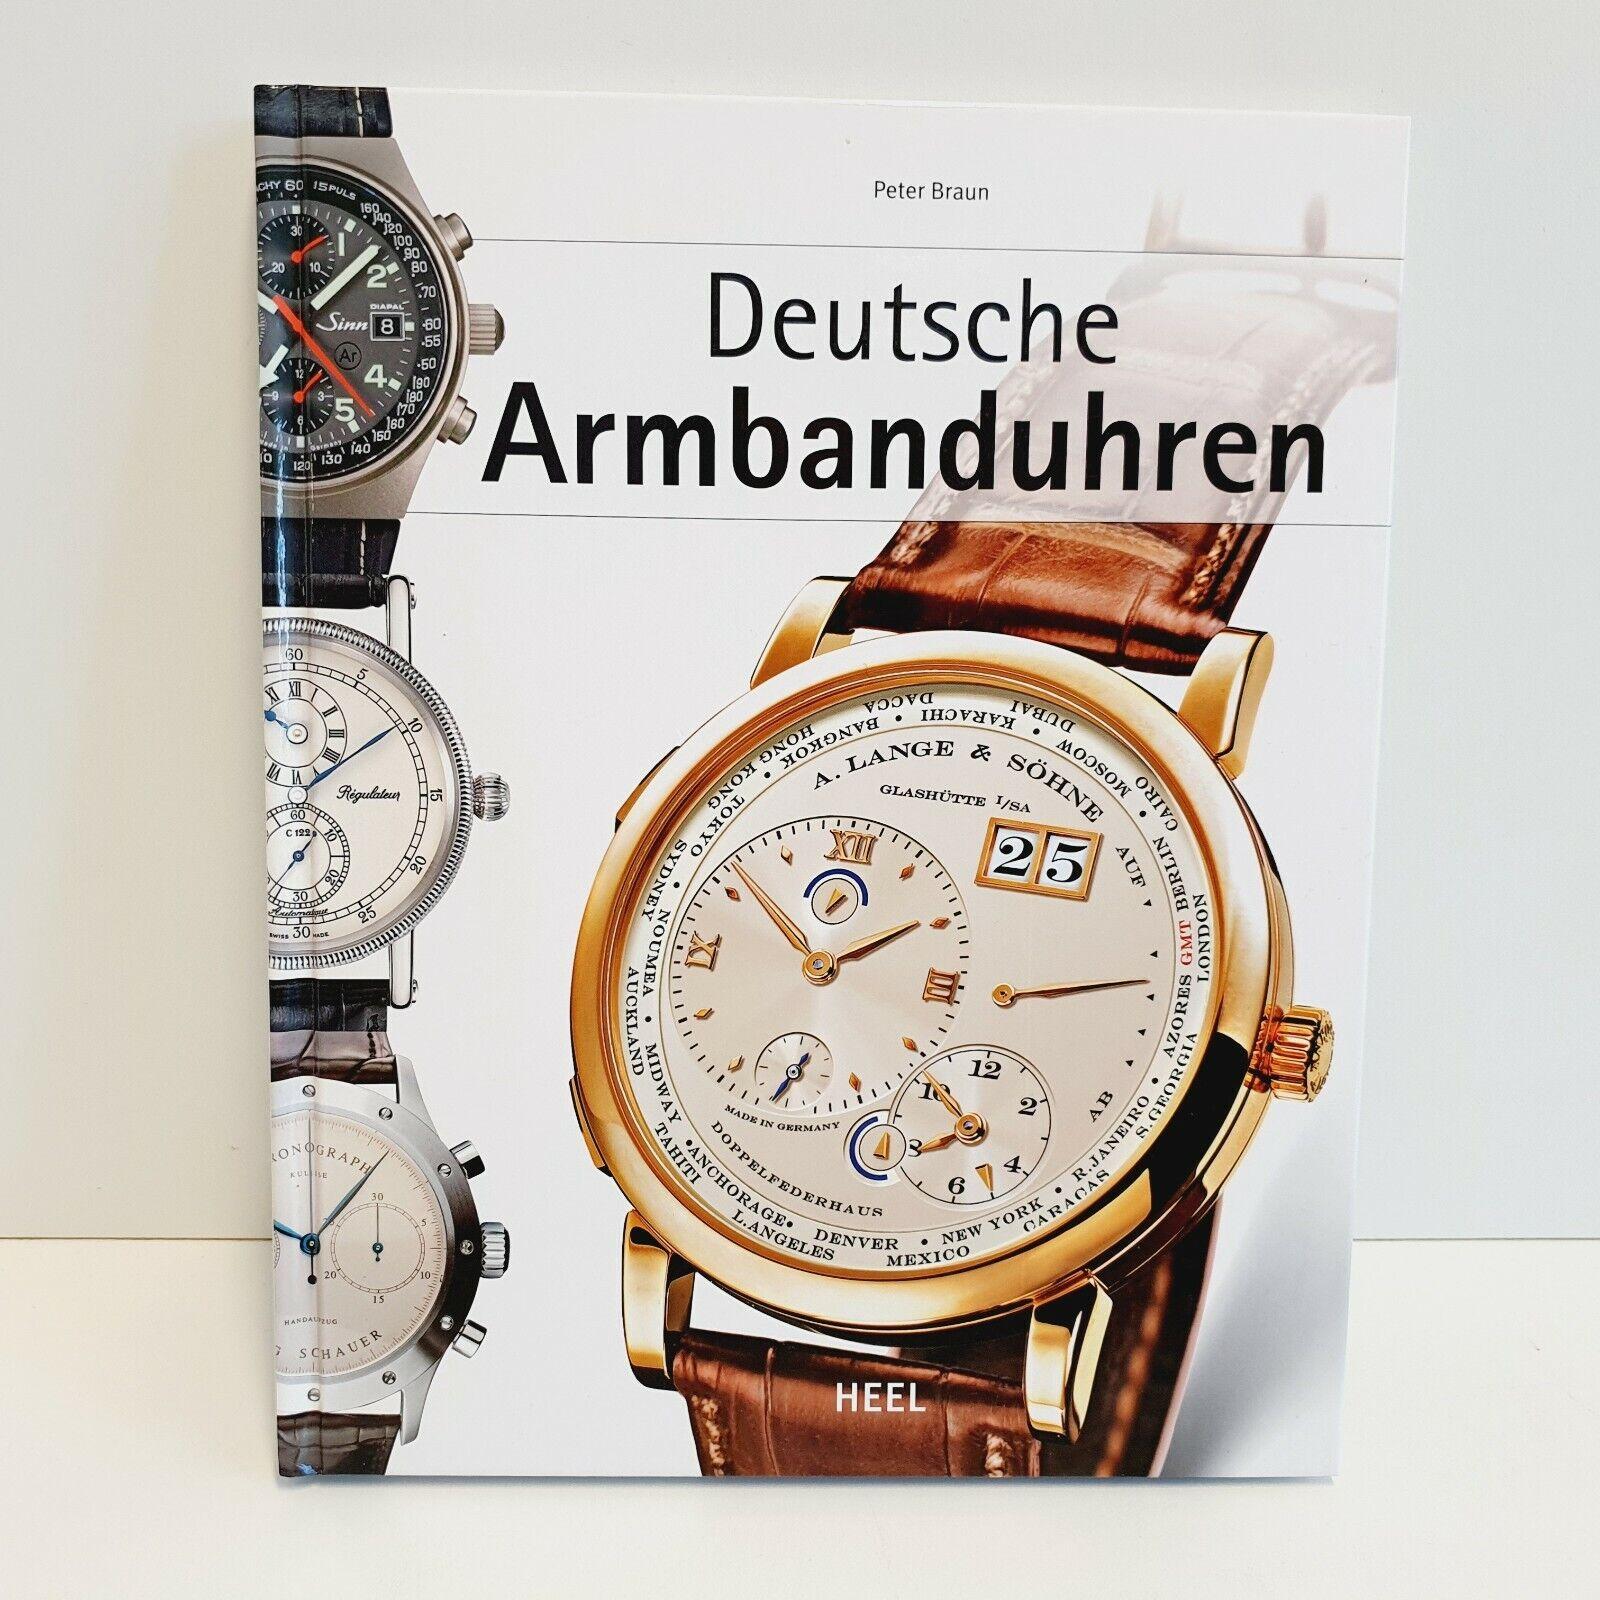 Deutsche Armbanduhren - Peter Braun - Heel - SEHR GUT